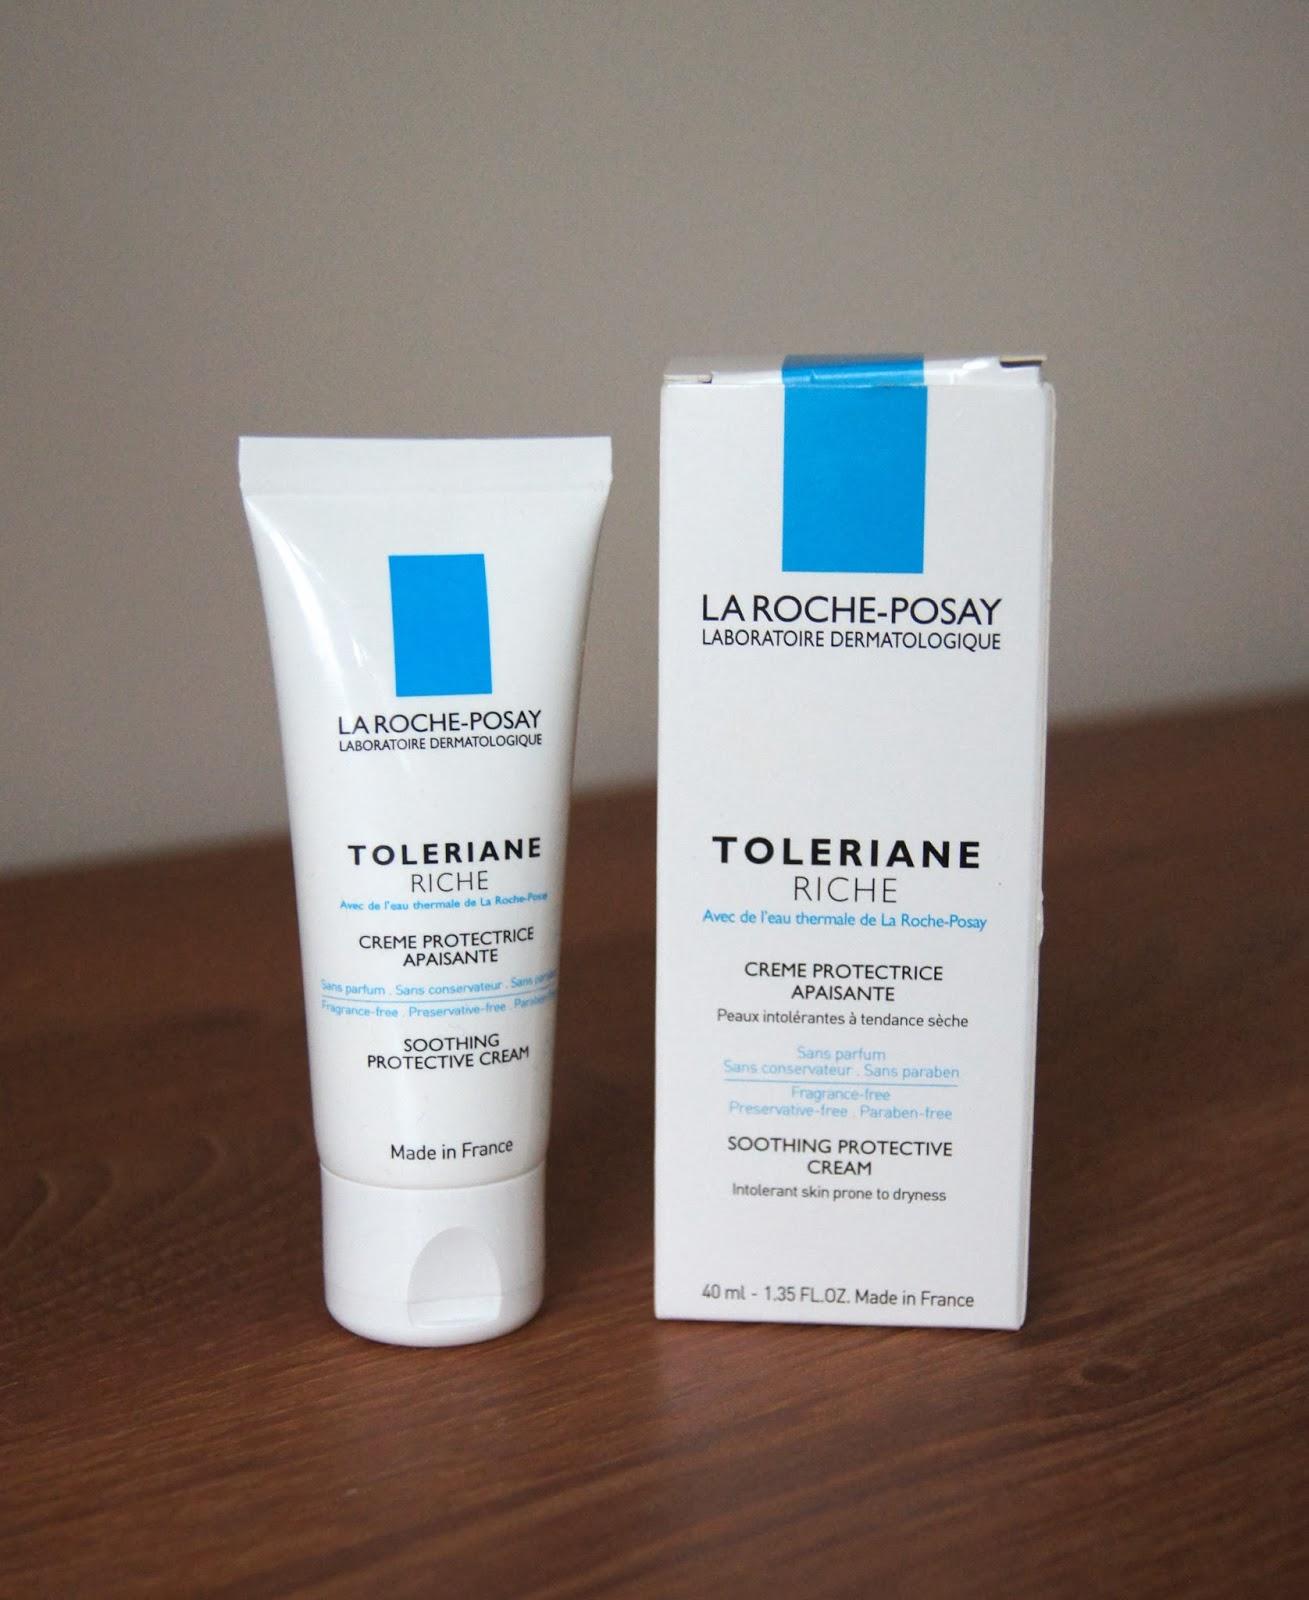 la roche posay toleriane riche soothing protective cream moisturiser review